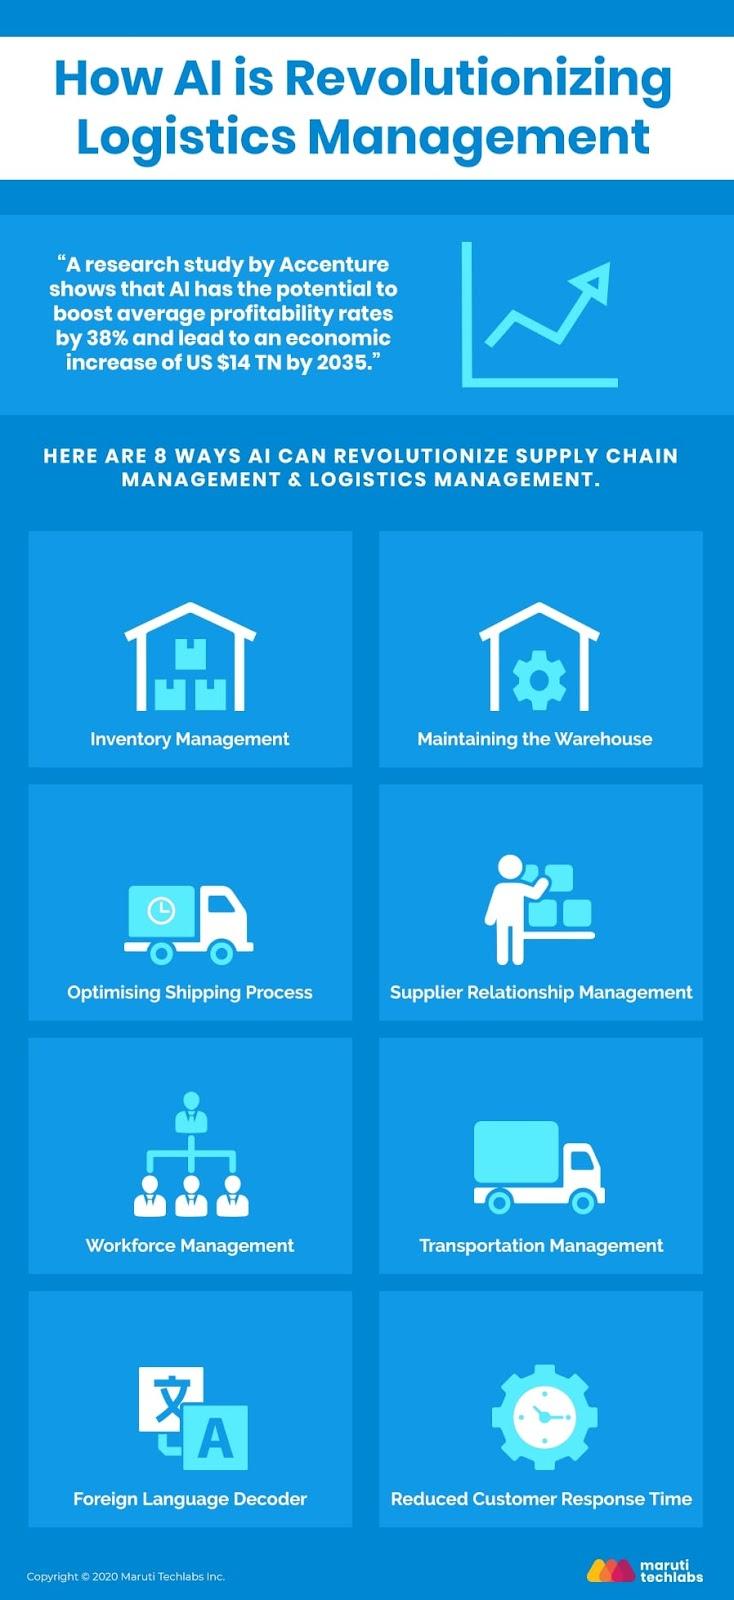 how-ai-is-revolutionizing-logistics-management